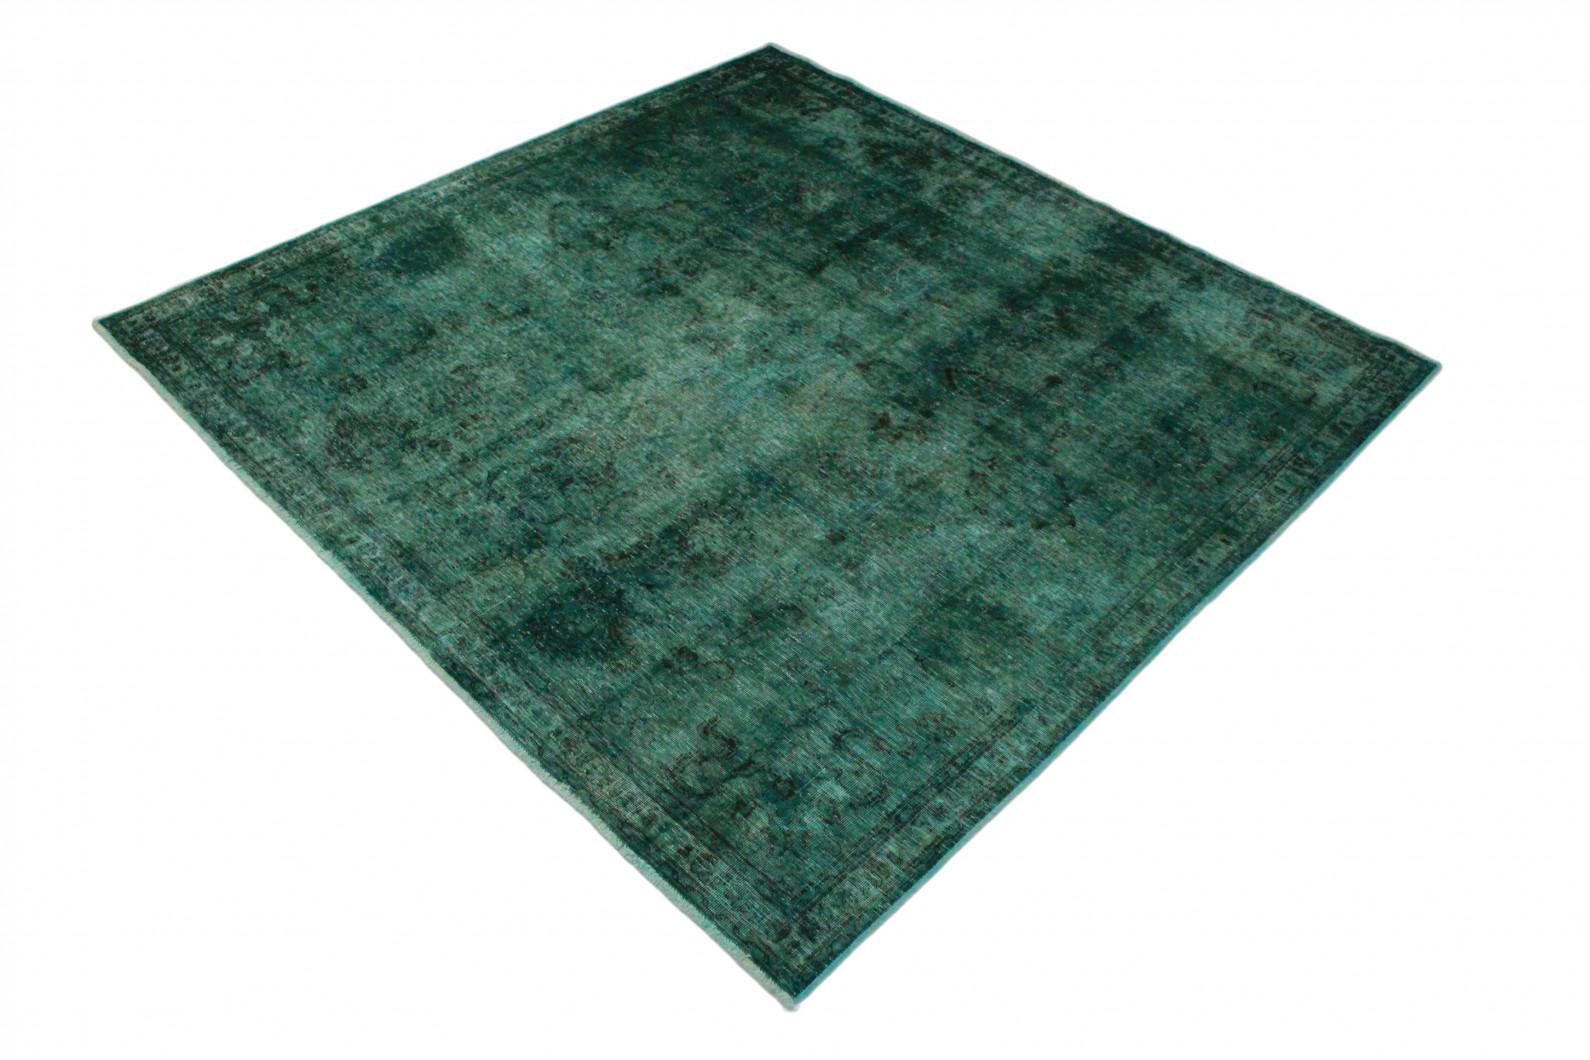 vintage teppich t rkis gr n in 220x220 1001 3566 bei kaufen. Black Bedroom Furniture Sets. Home Design Ideas